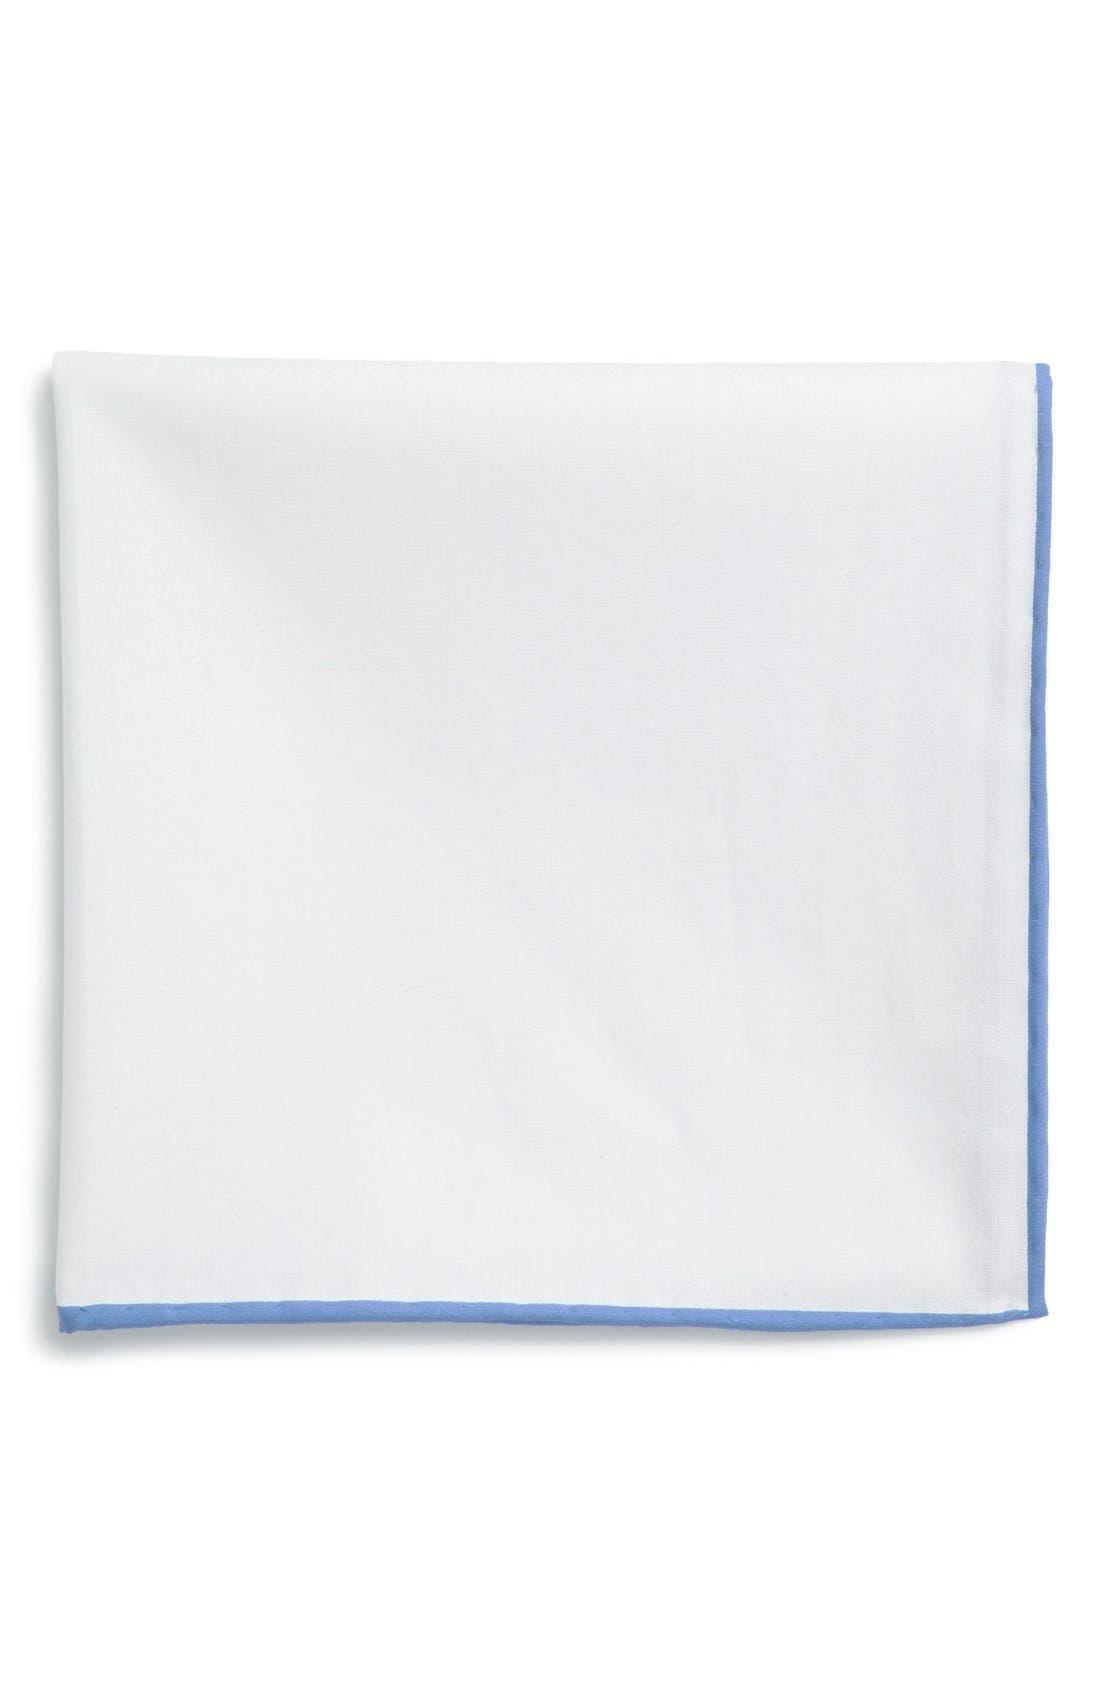 Cotton Solid Pocket Square,                             Main thumbnail 1, color,                             White/ Light Blue